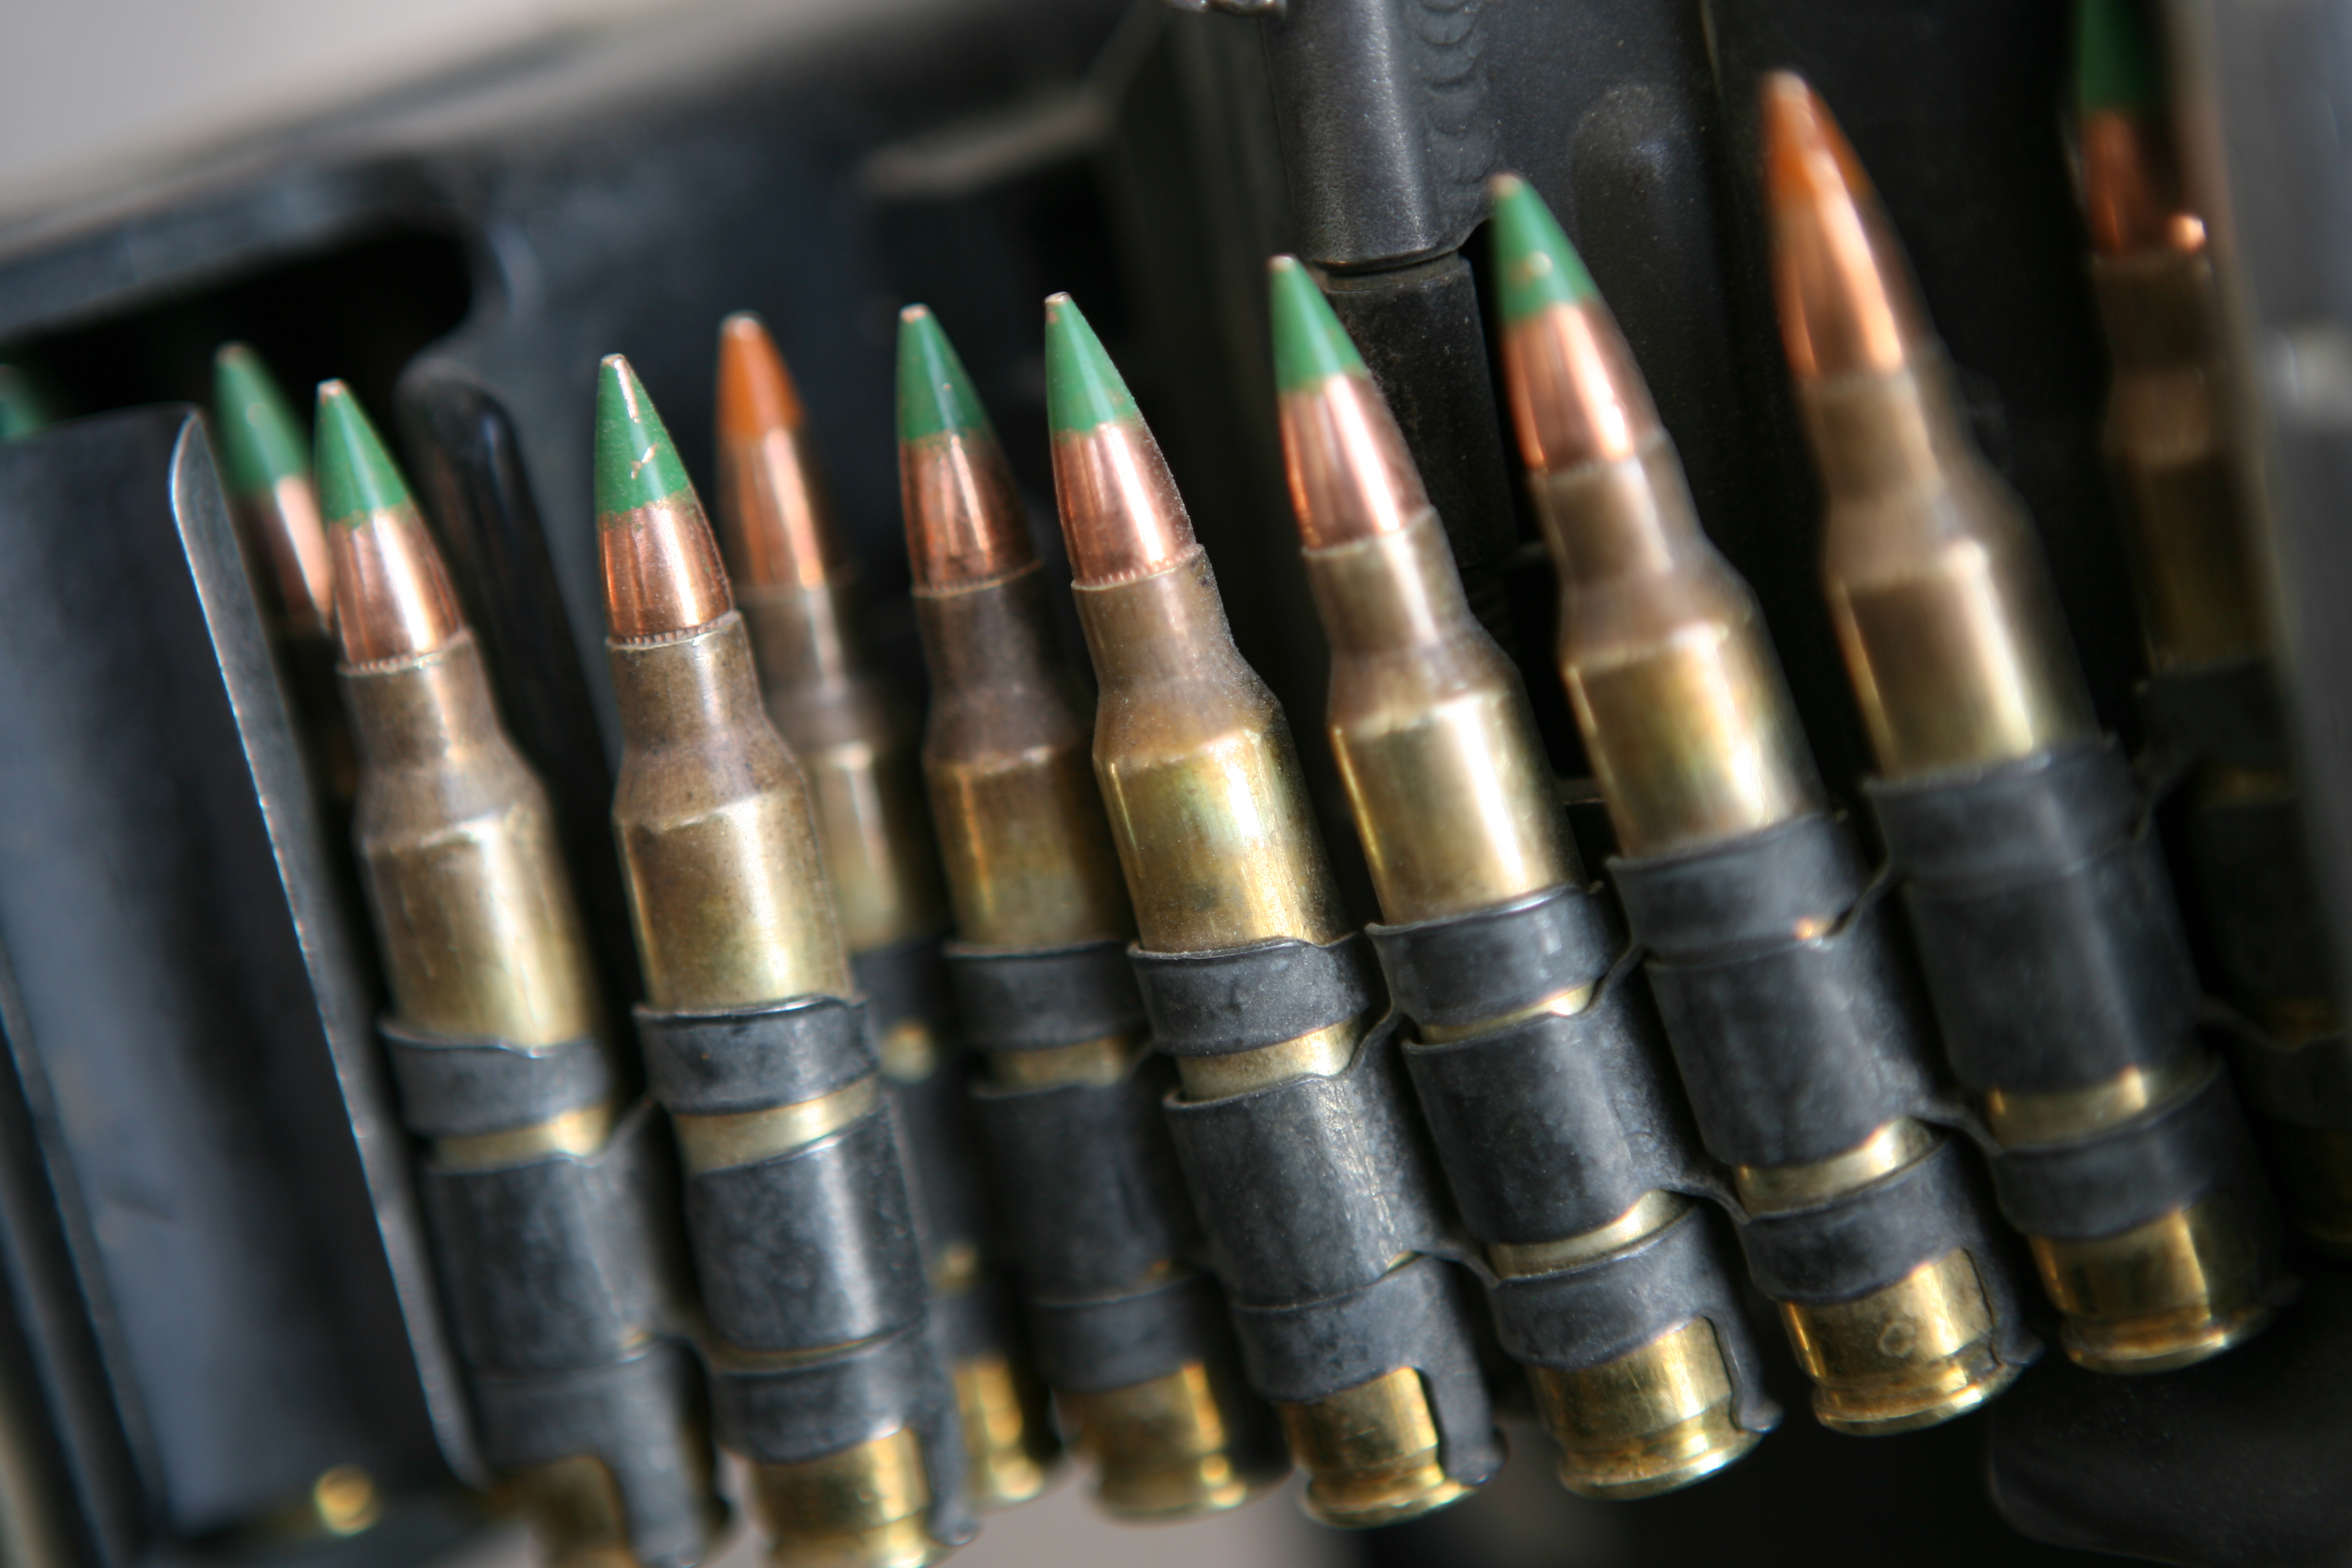 Chart Of Bullet Caliber Size: Ammunition Belt 5.56 mm.jpg - Wikimedia Commons,Chart